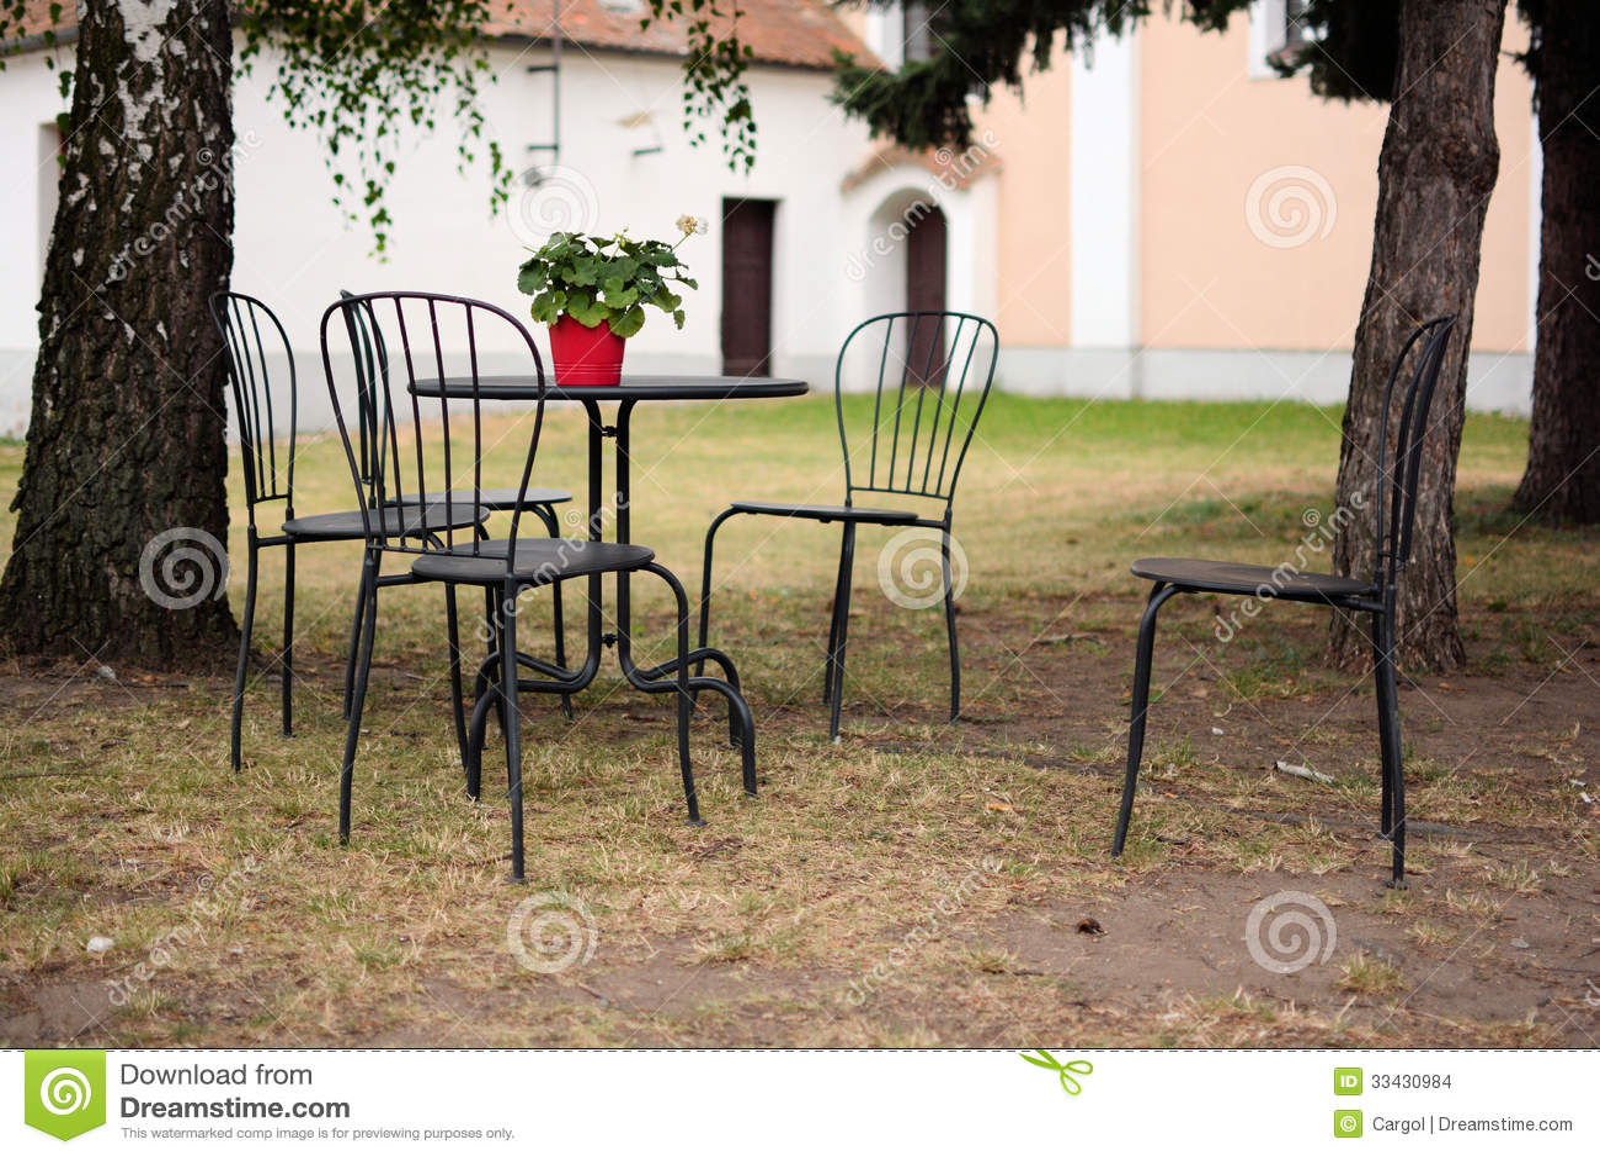 Outdoor Garden Patio Furniture Stock Photo - Image of nature ...